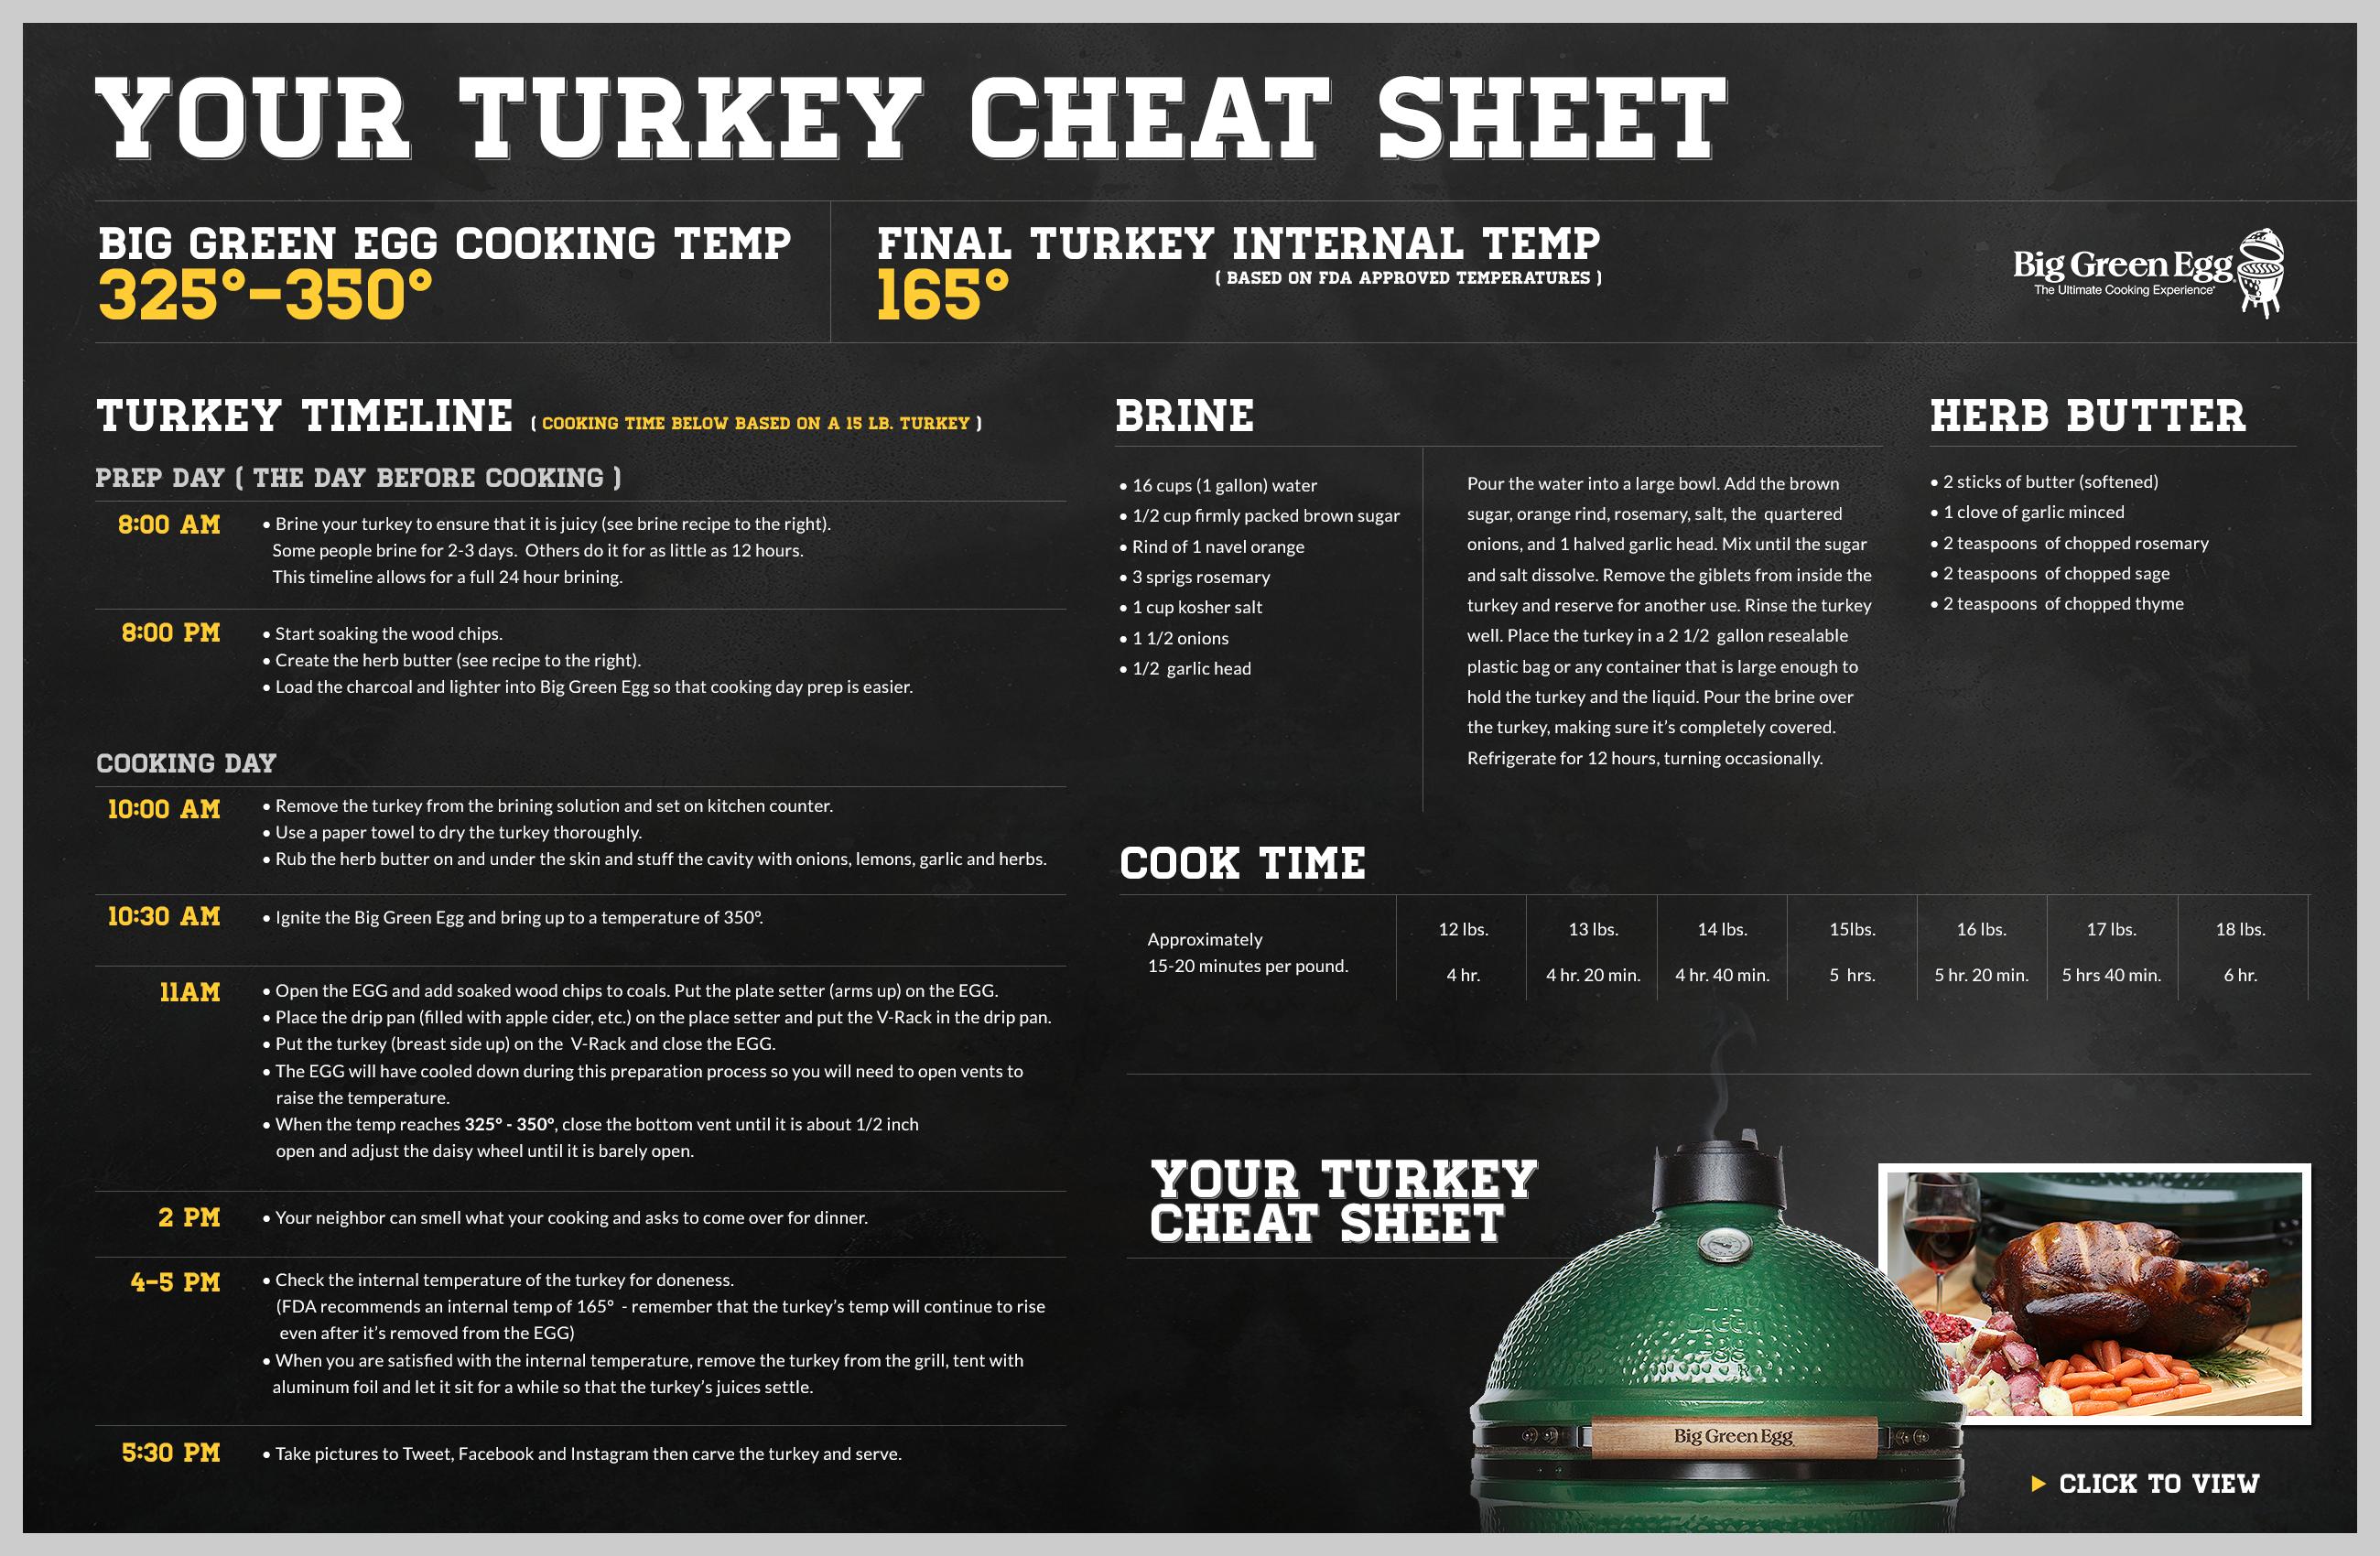 big-green-egg-turkey-cheat-sheet.png